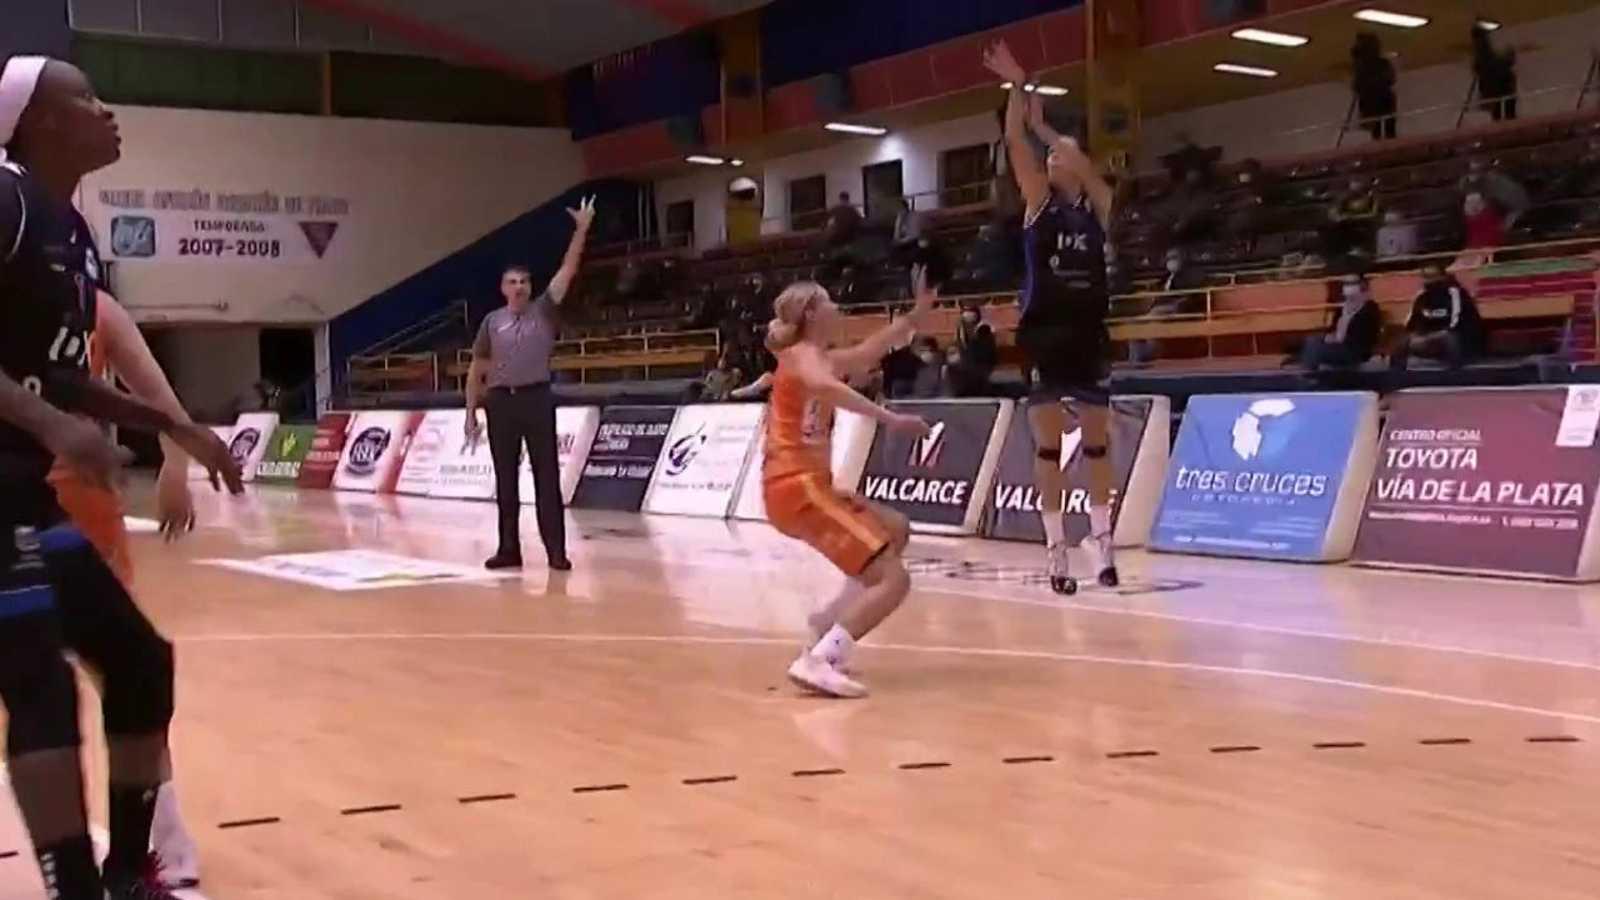 Baloncesto - Liga femenina Endesa. 7ª jornada: Quesos El Pastor - IDK Euskotren - ver ahora